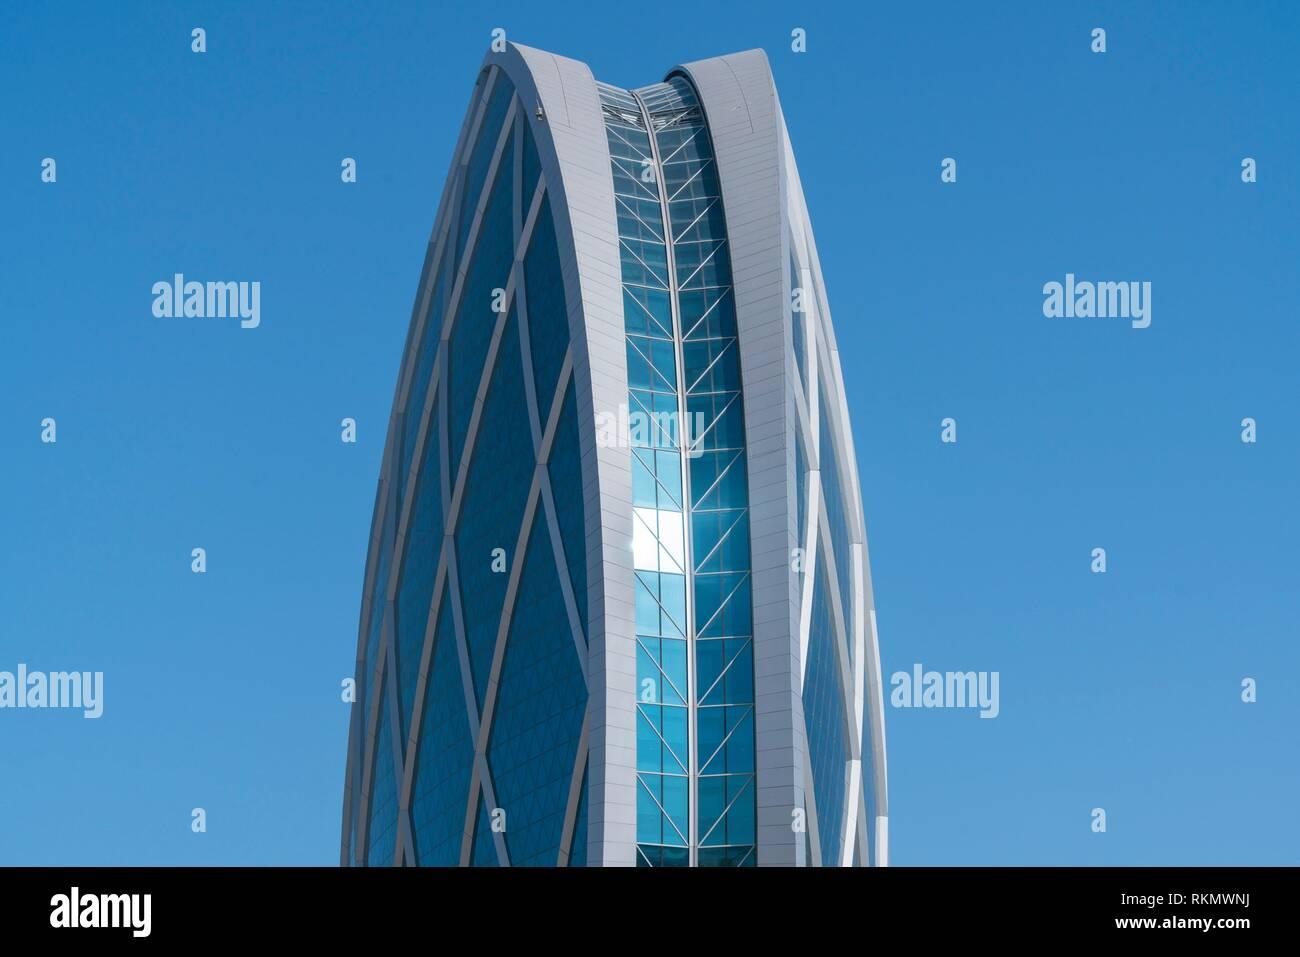 Aldar-HQ Round Skyscraper, Al Raha Beach, Abu Dhabi City, Emirate of Abu Dhabi, Persian Gulf, United Arab Emirates, UAE, The Middle East. - Stock Image